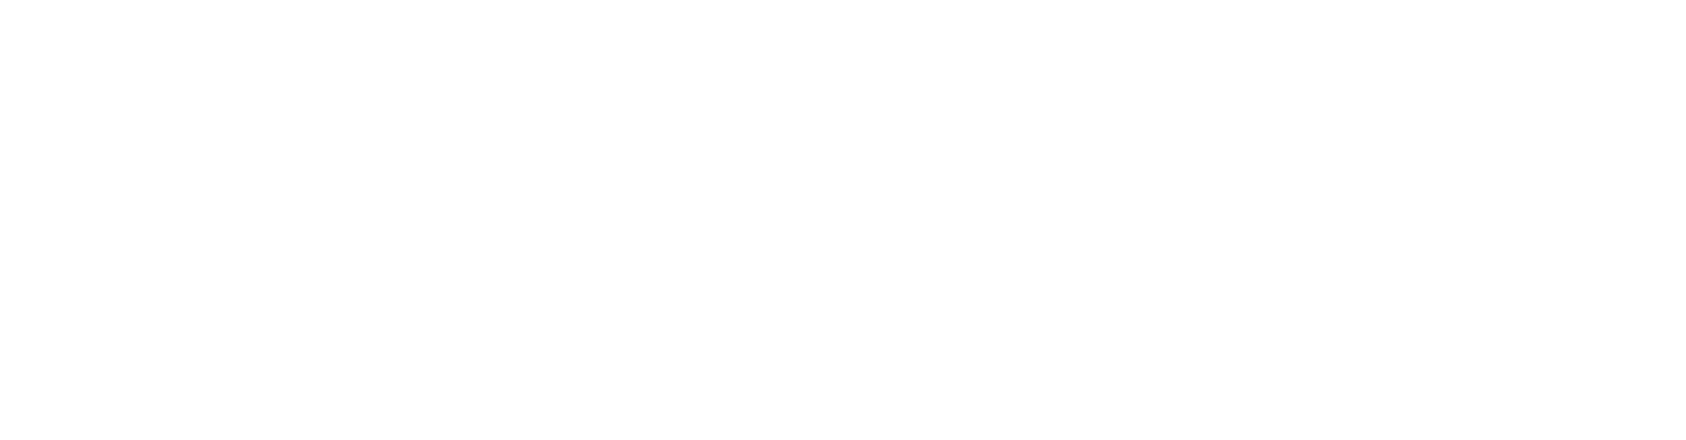 Leadership Communicators Roundtable